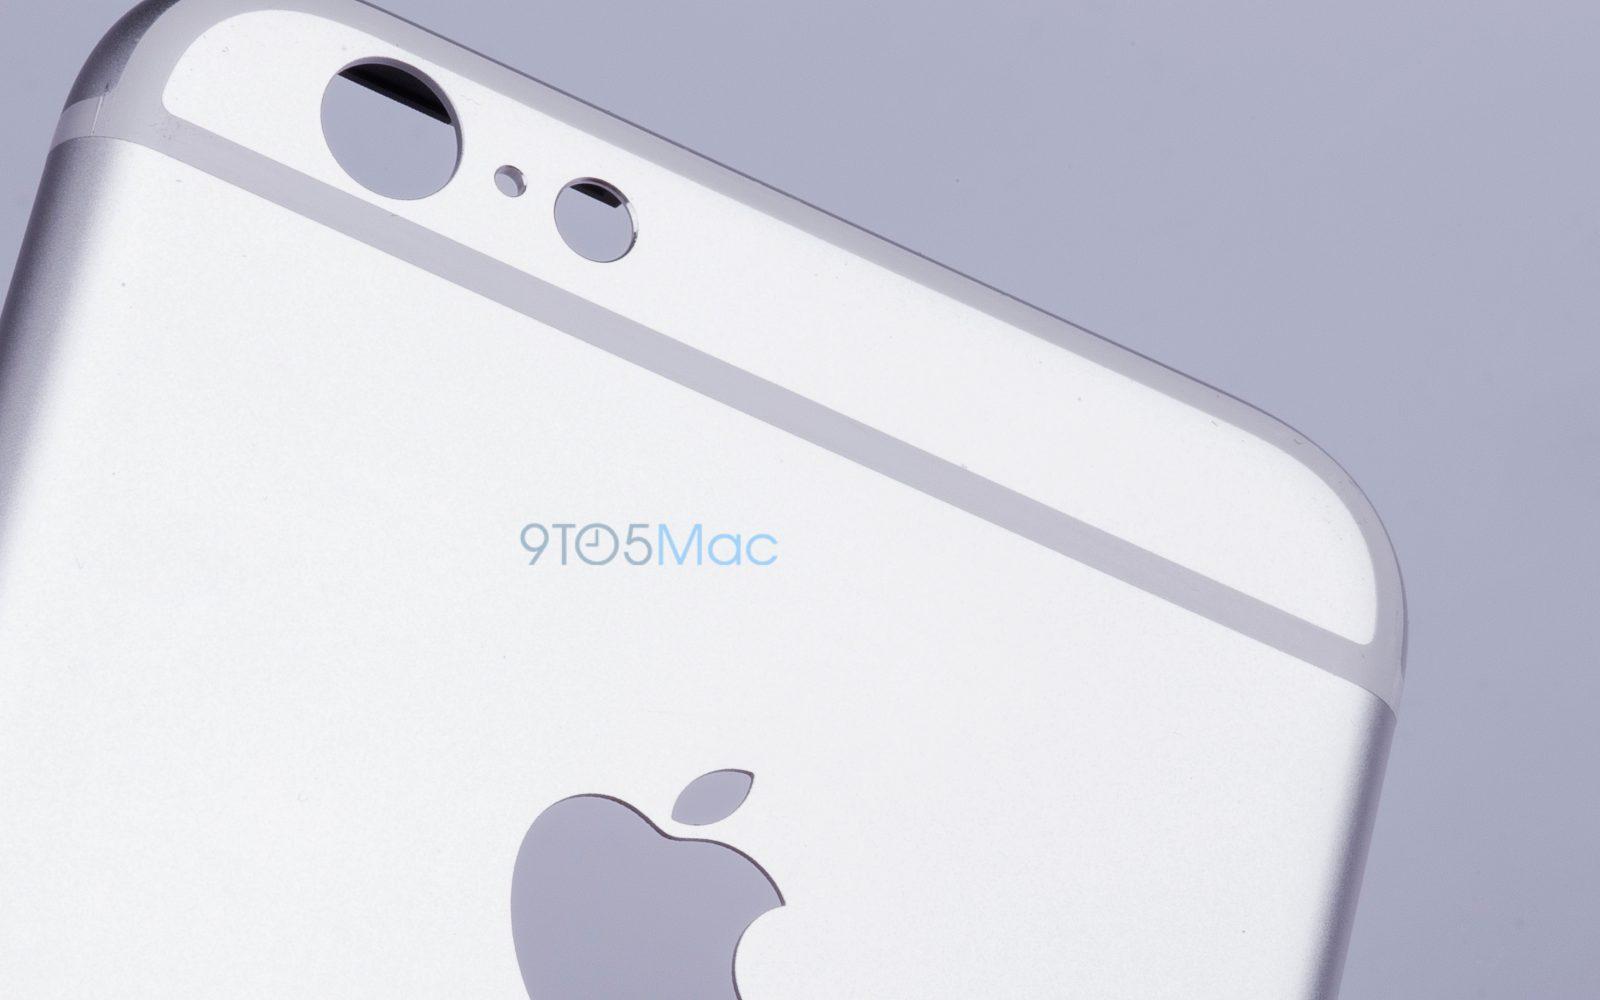 iPhone 6S camera: 12 megapixel photos, 4K video recording